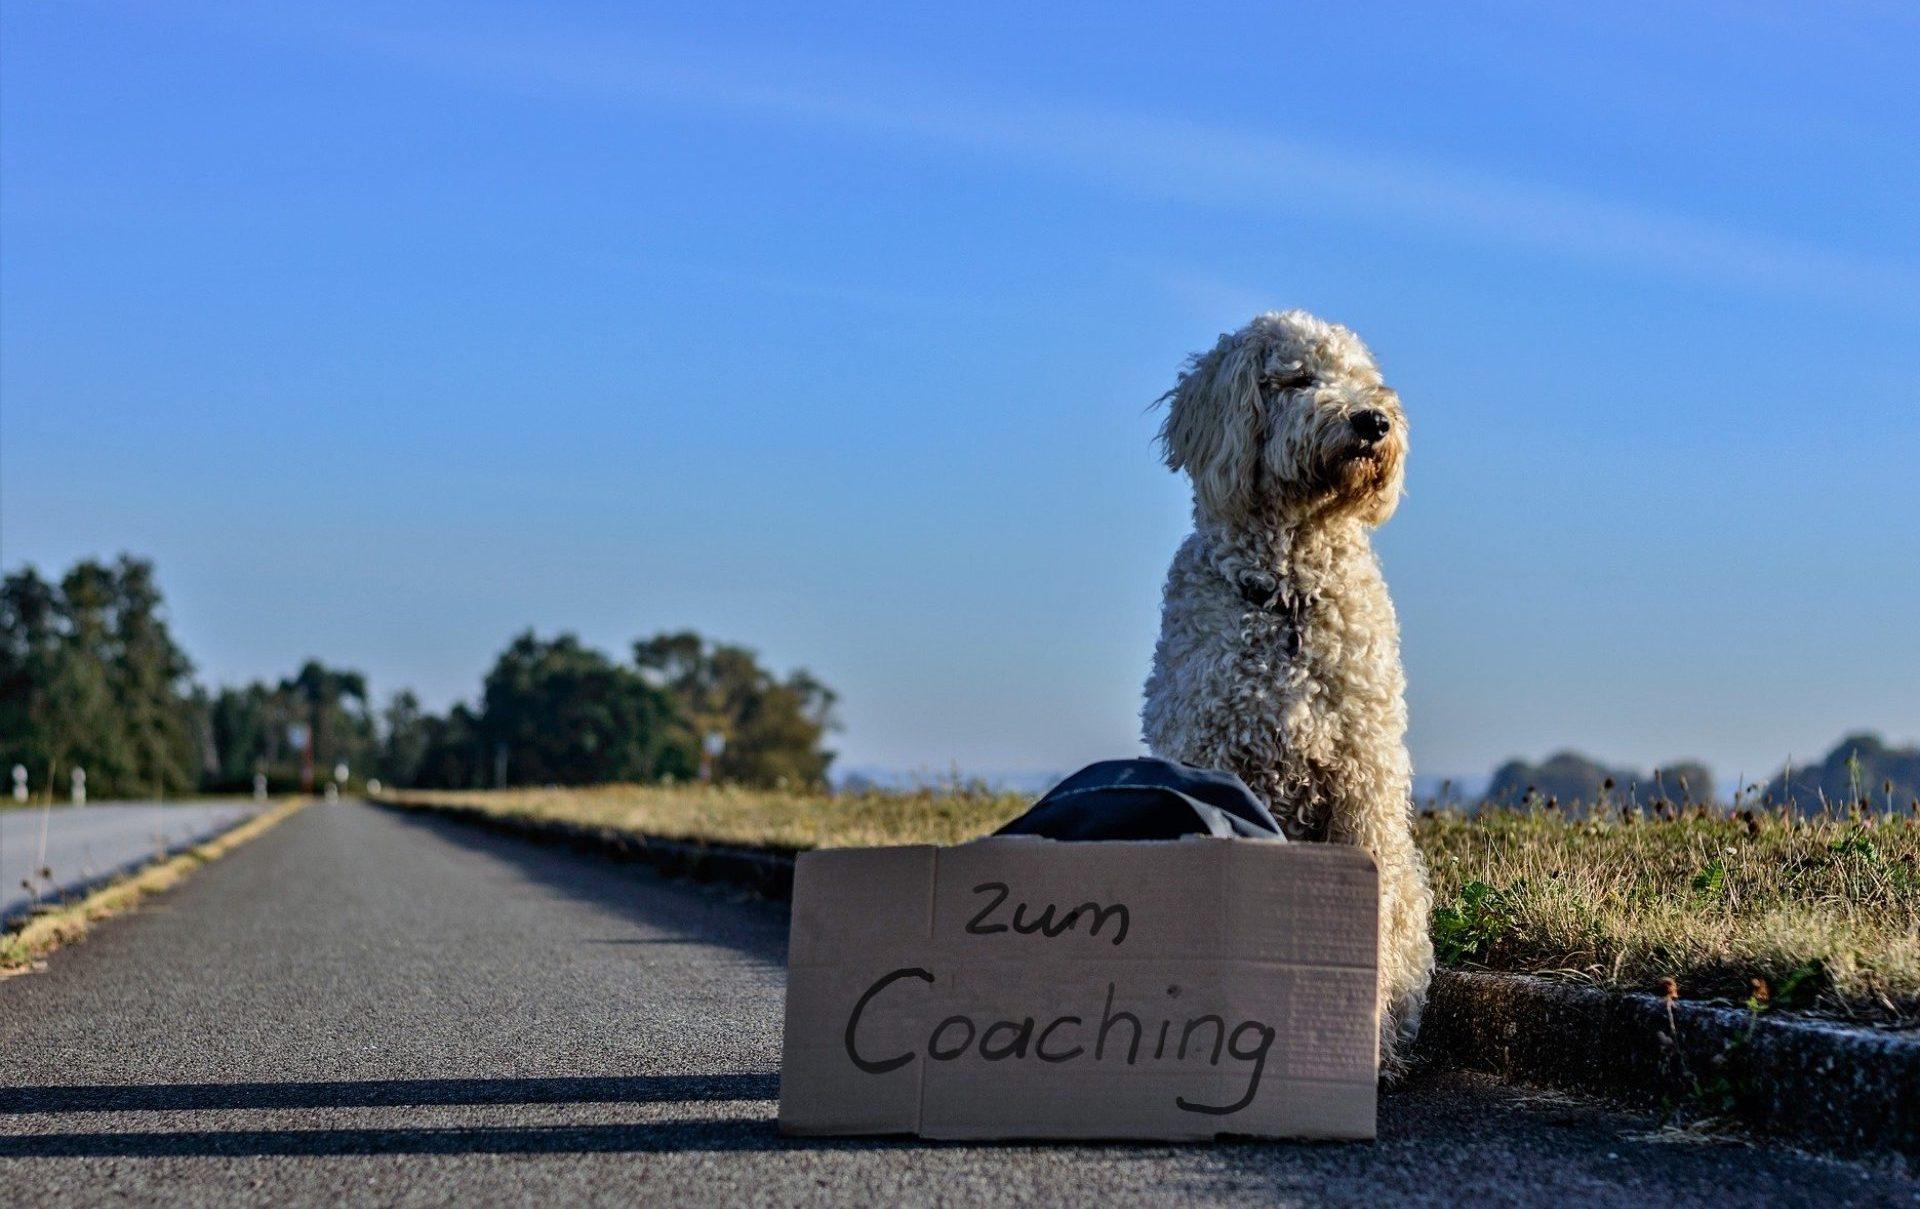 Aport Hundeerziehung-Coaching